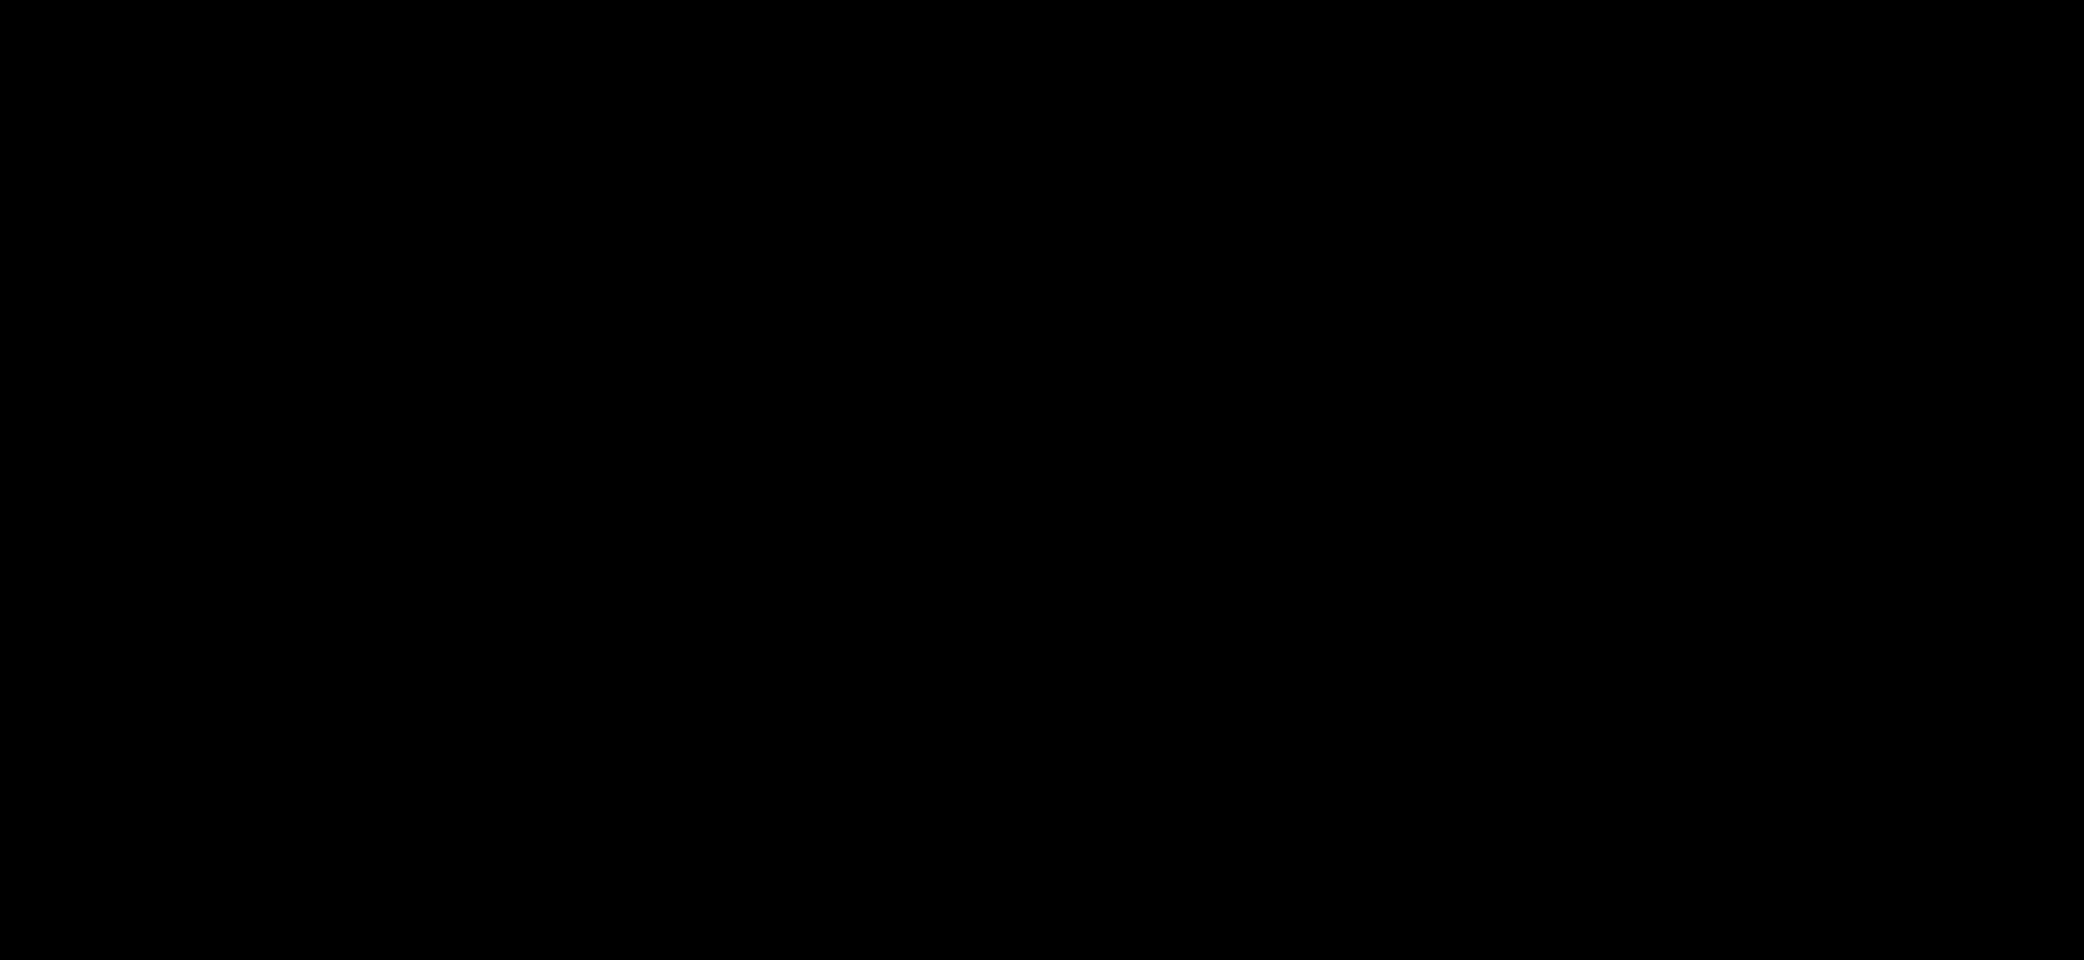 eev-logo-hires-3